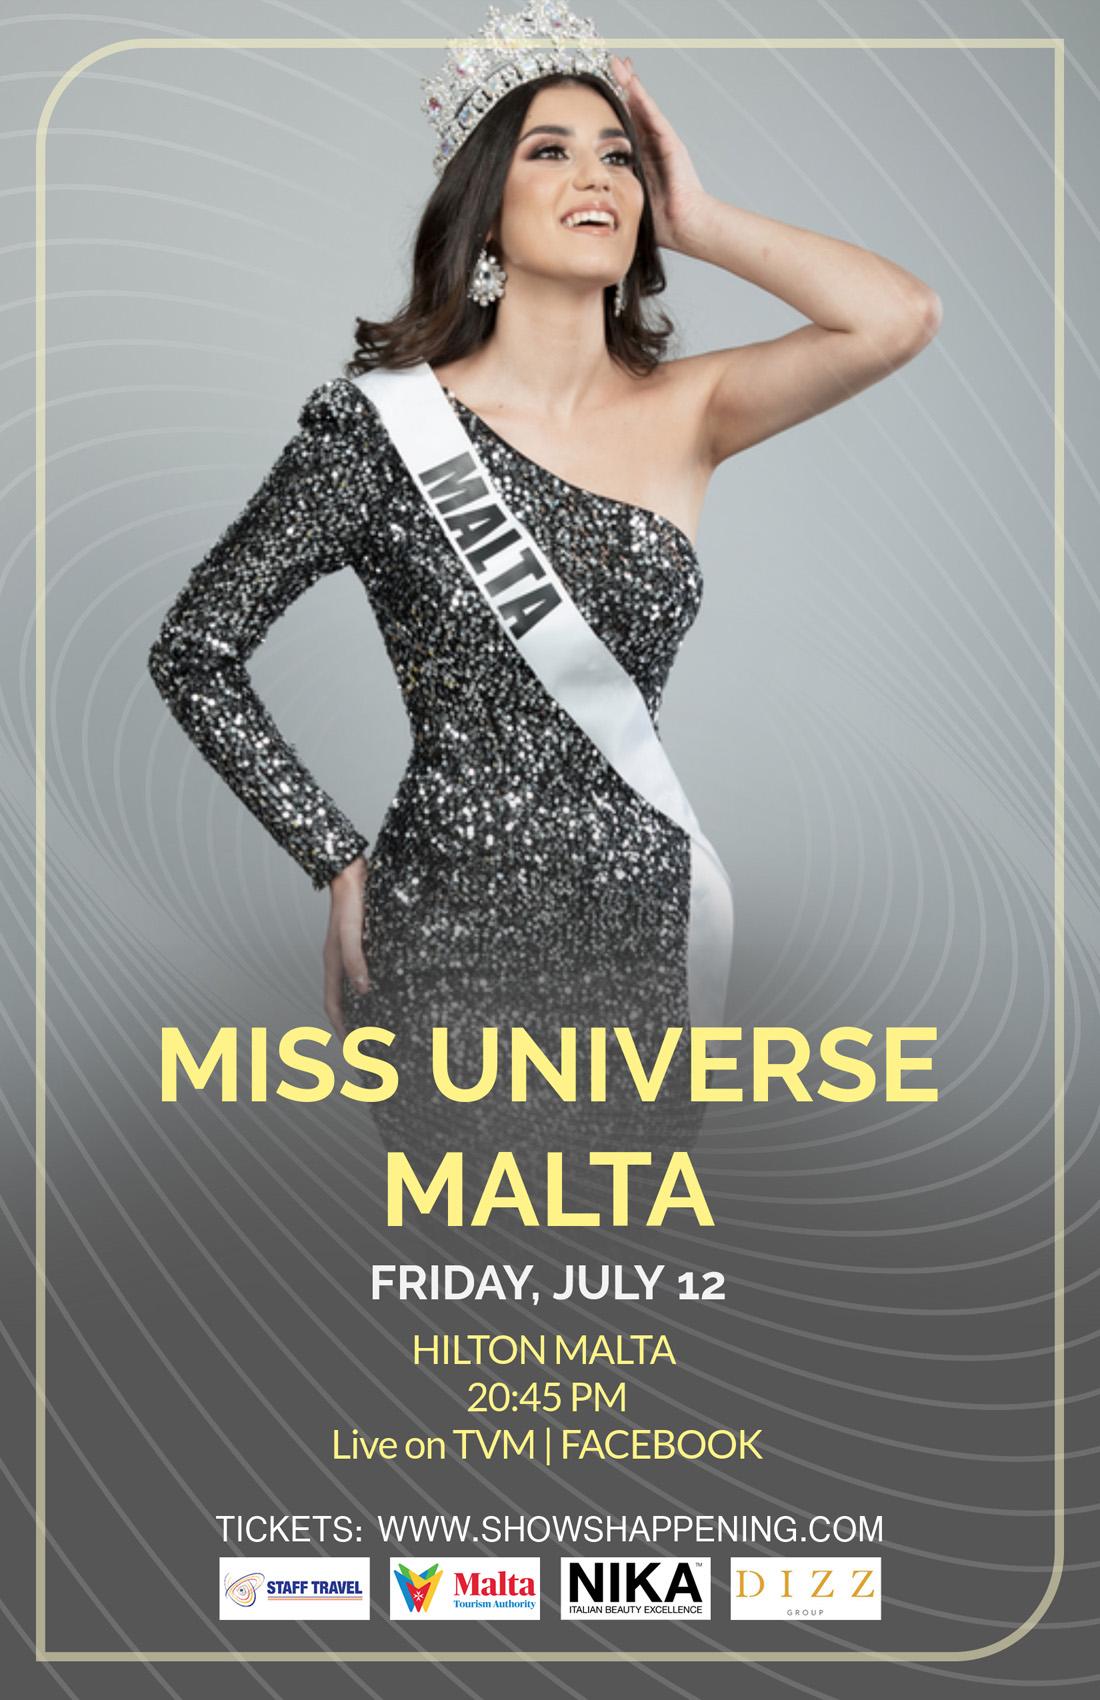 Miss Universe Malta 2019 flyer